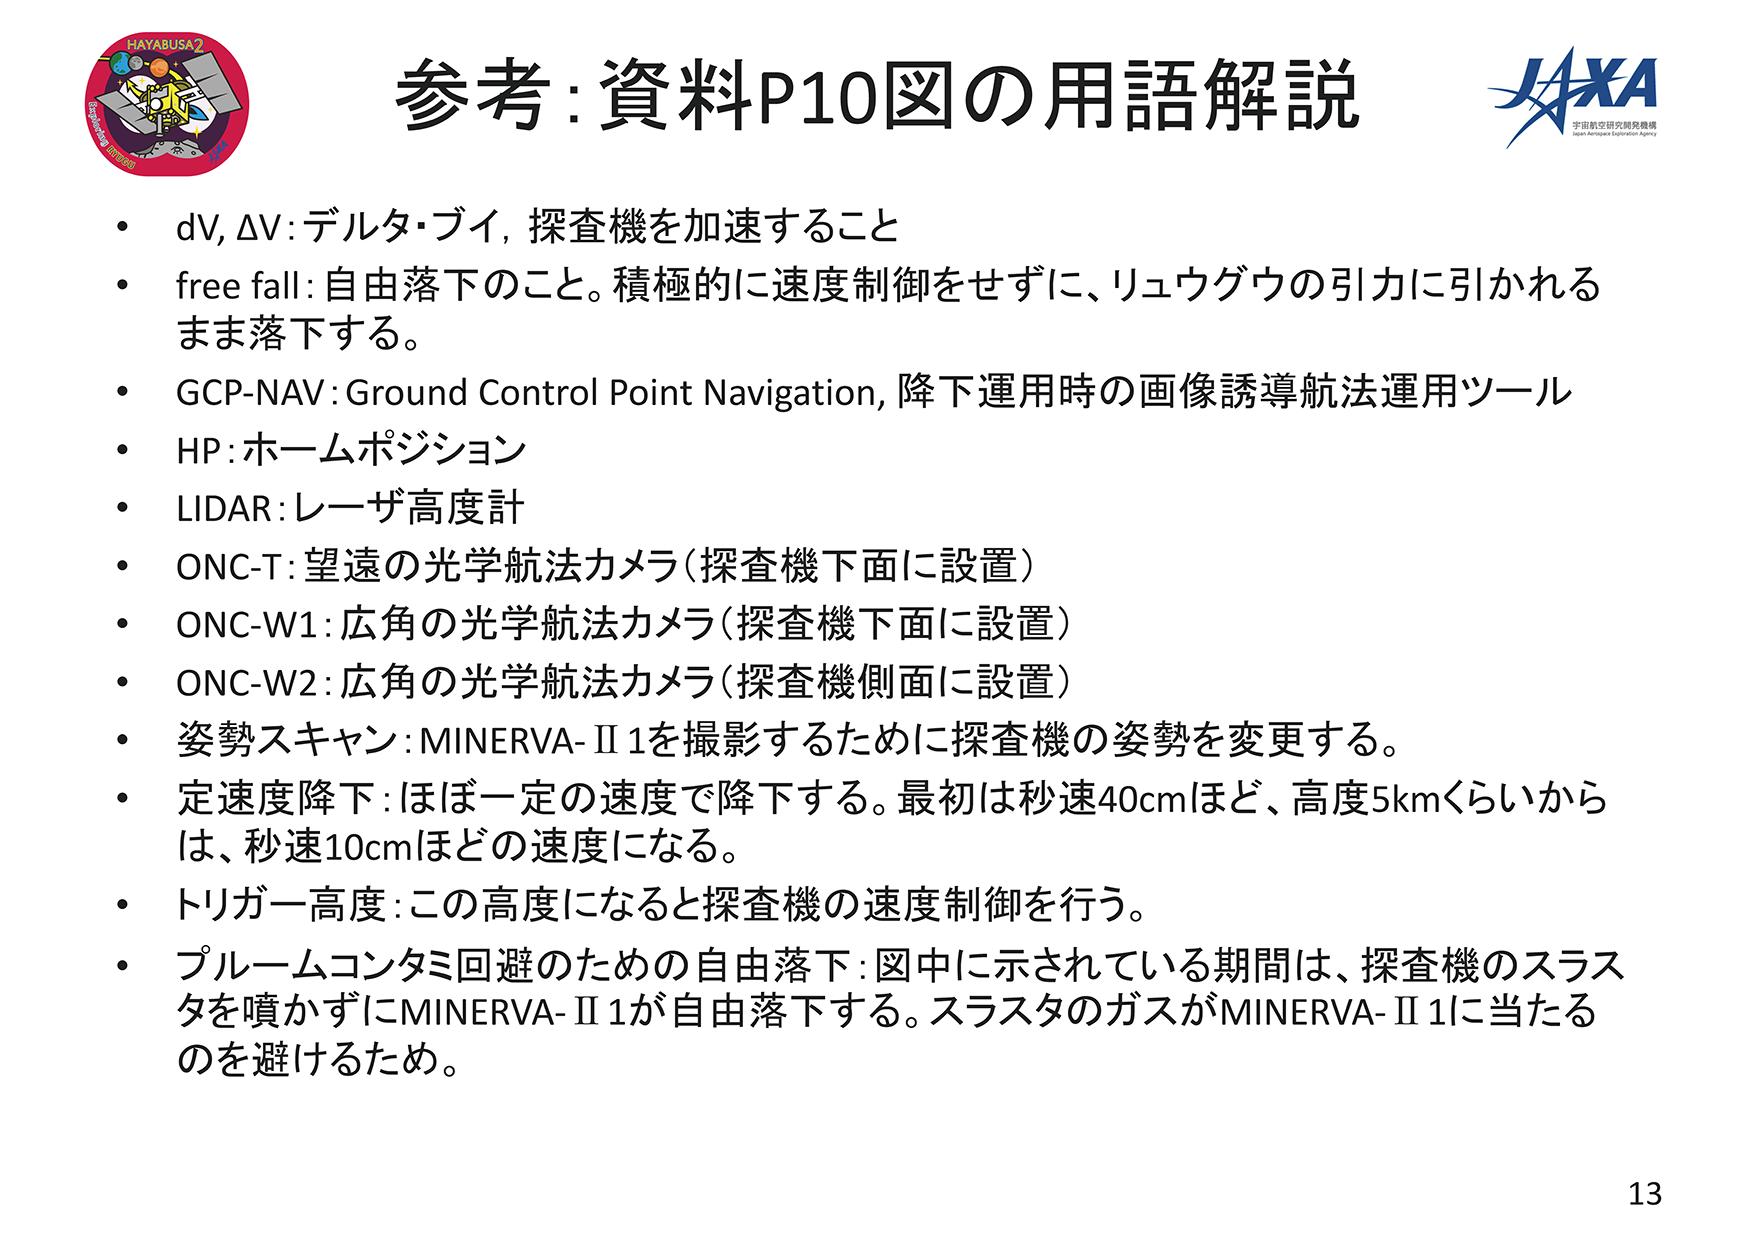 f:id:Imamura:20180921145503p:plain